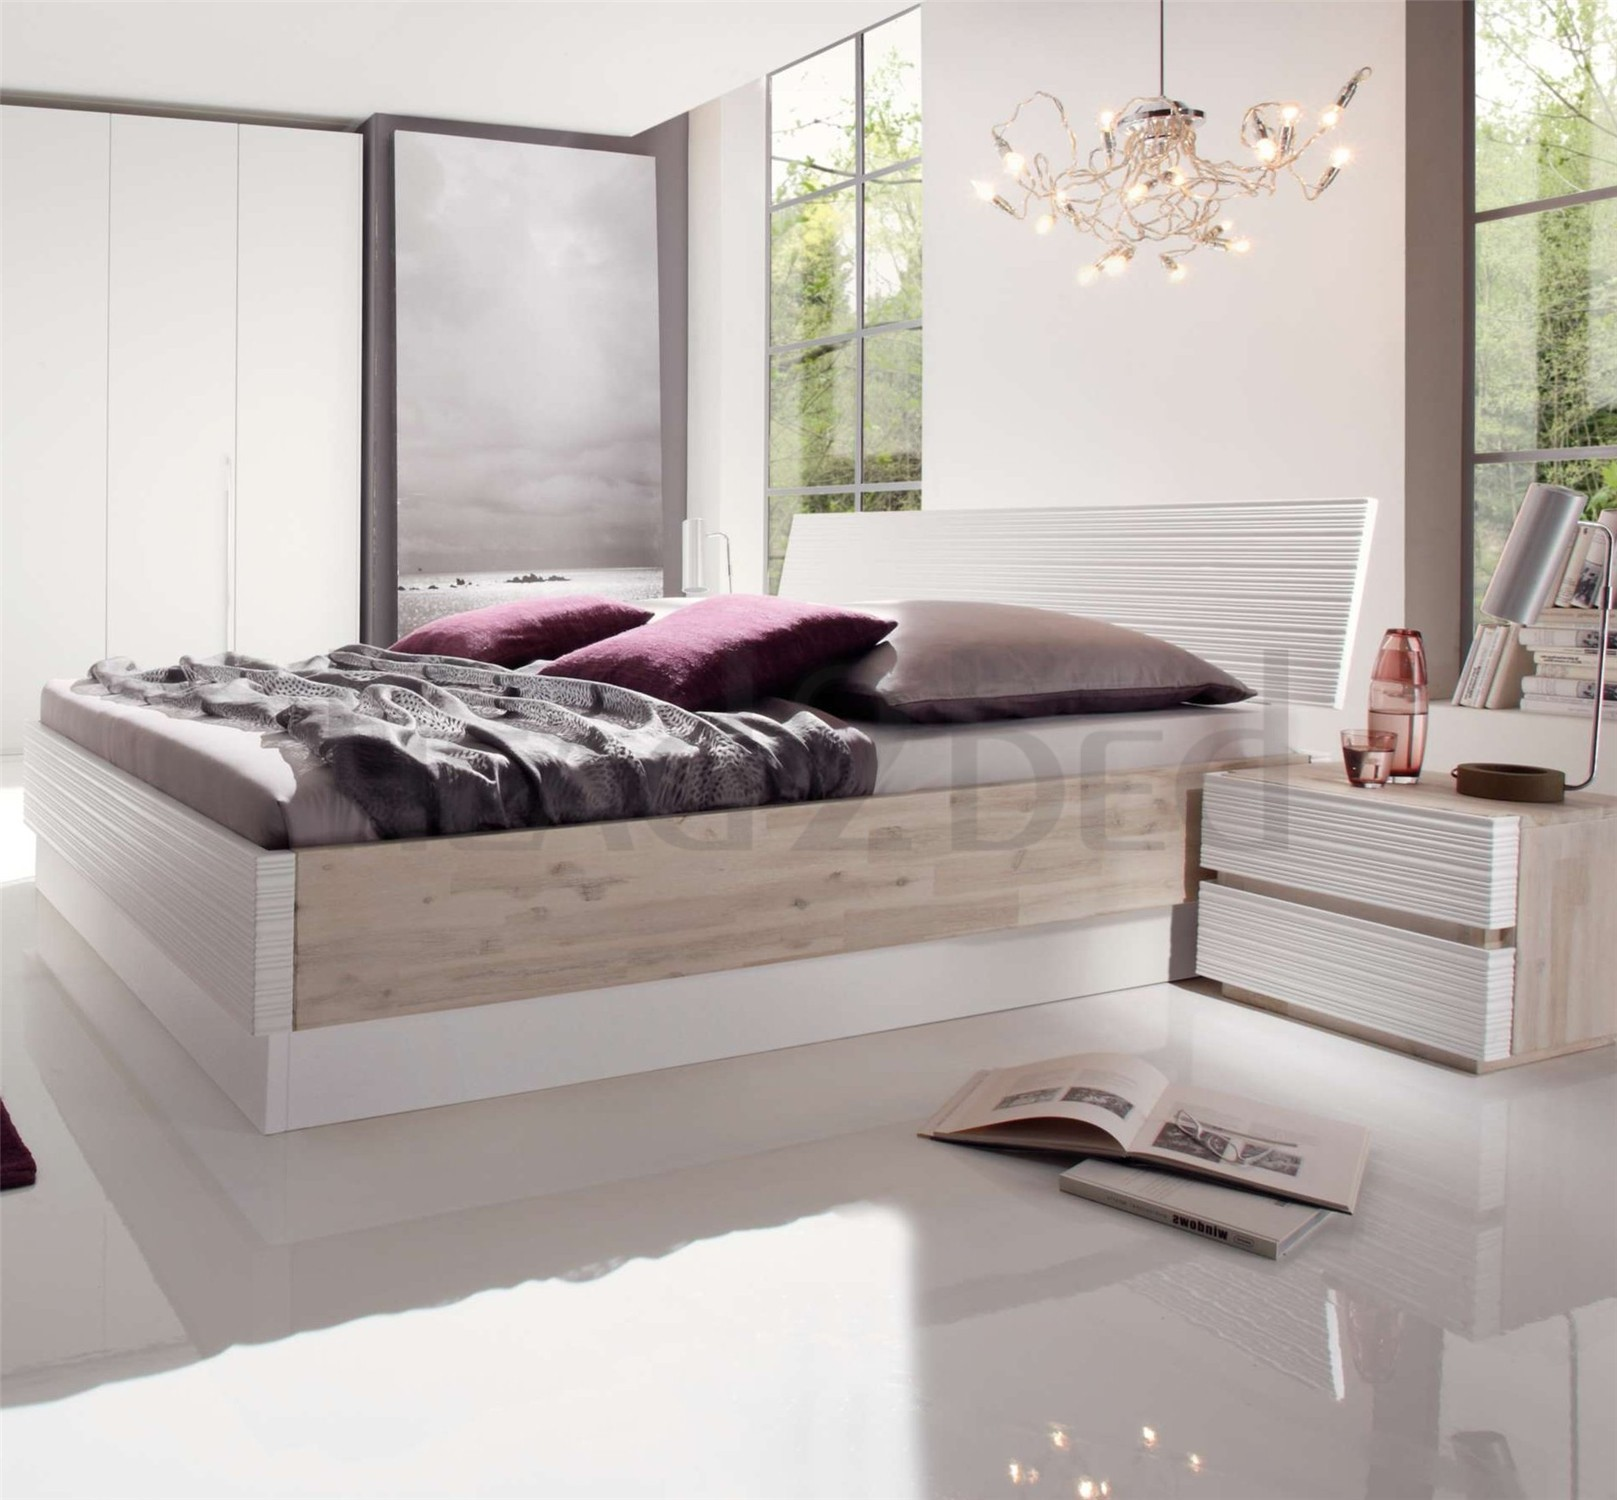 Coco Queen Storage Bed C6413aDownload Picturesque Design